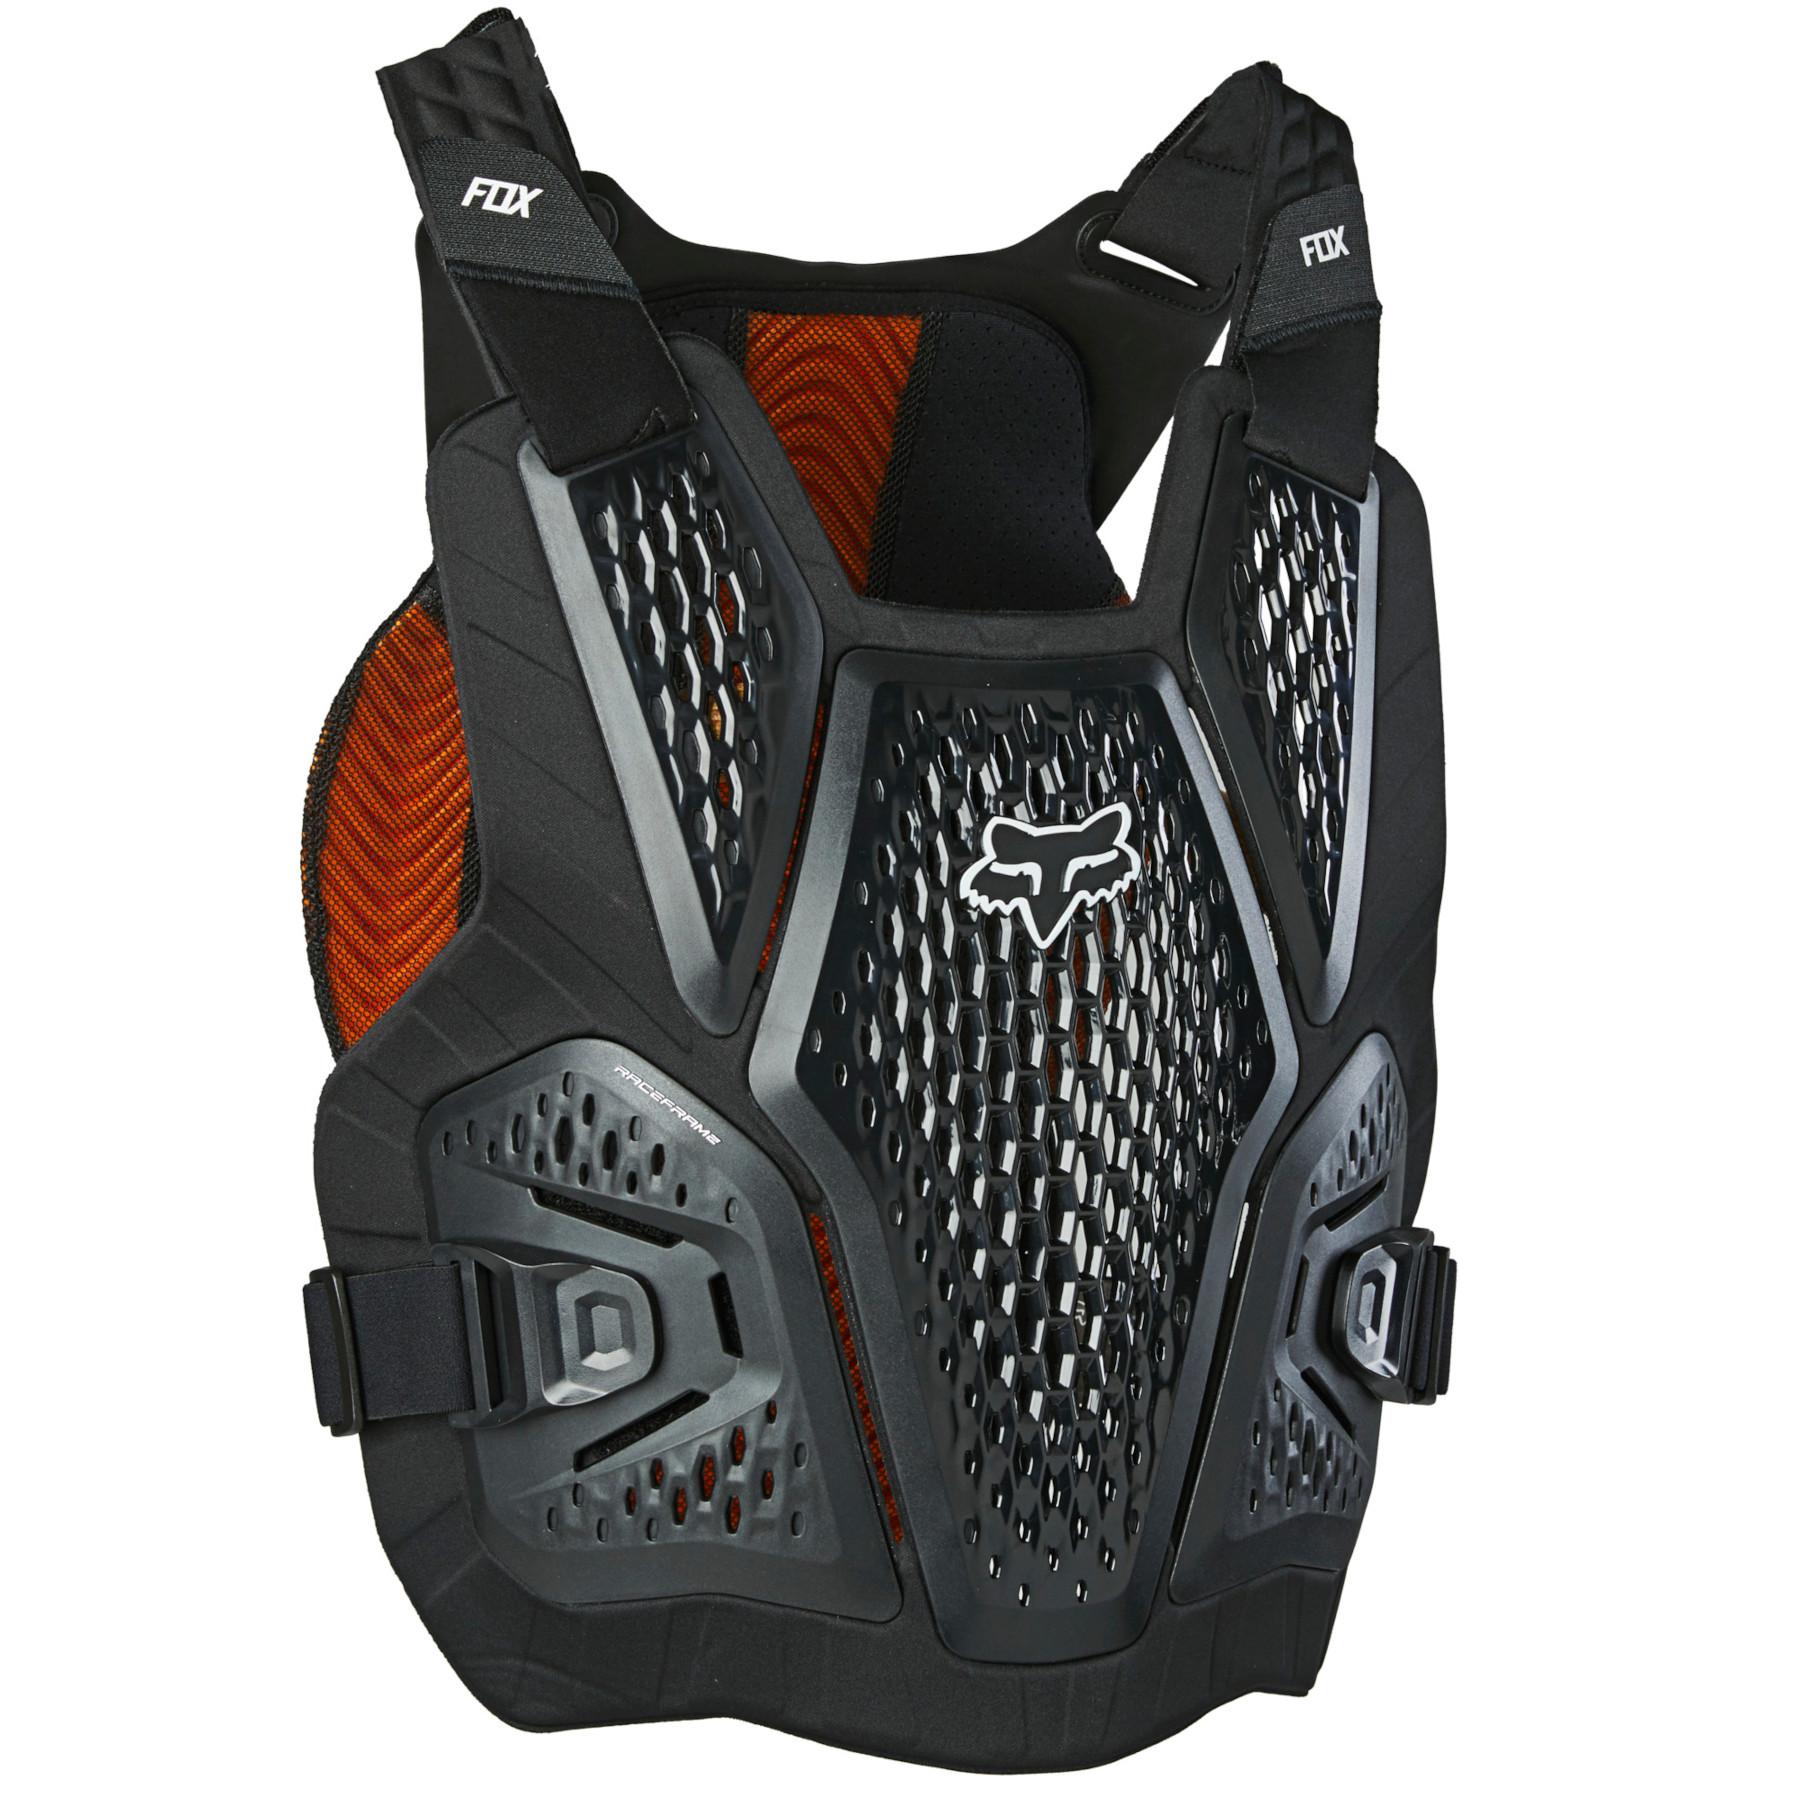 Produktbild von FOX Raceframe Impact SB CE D3O-Protektor - black